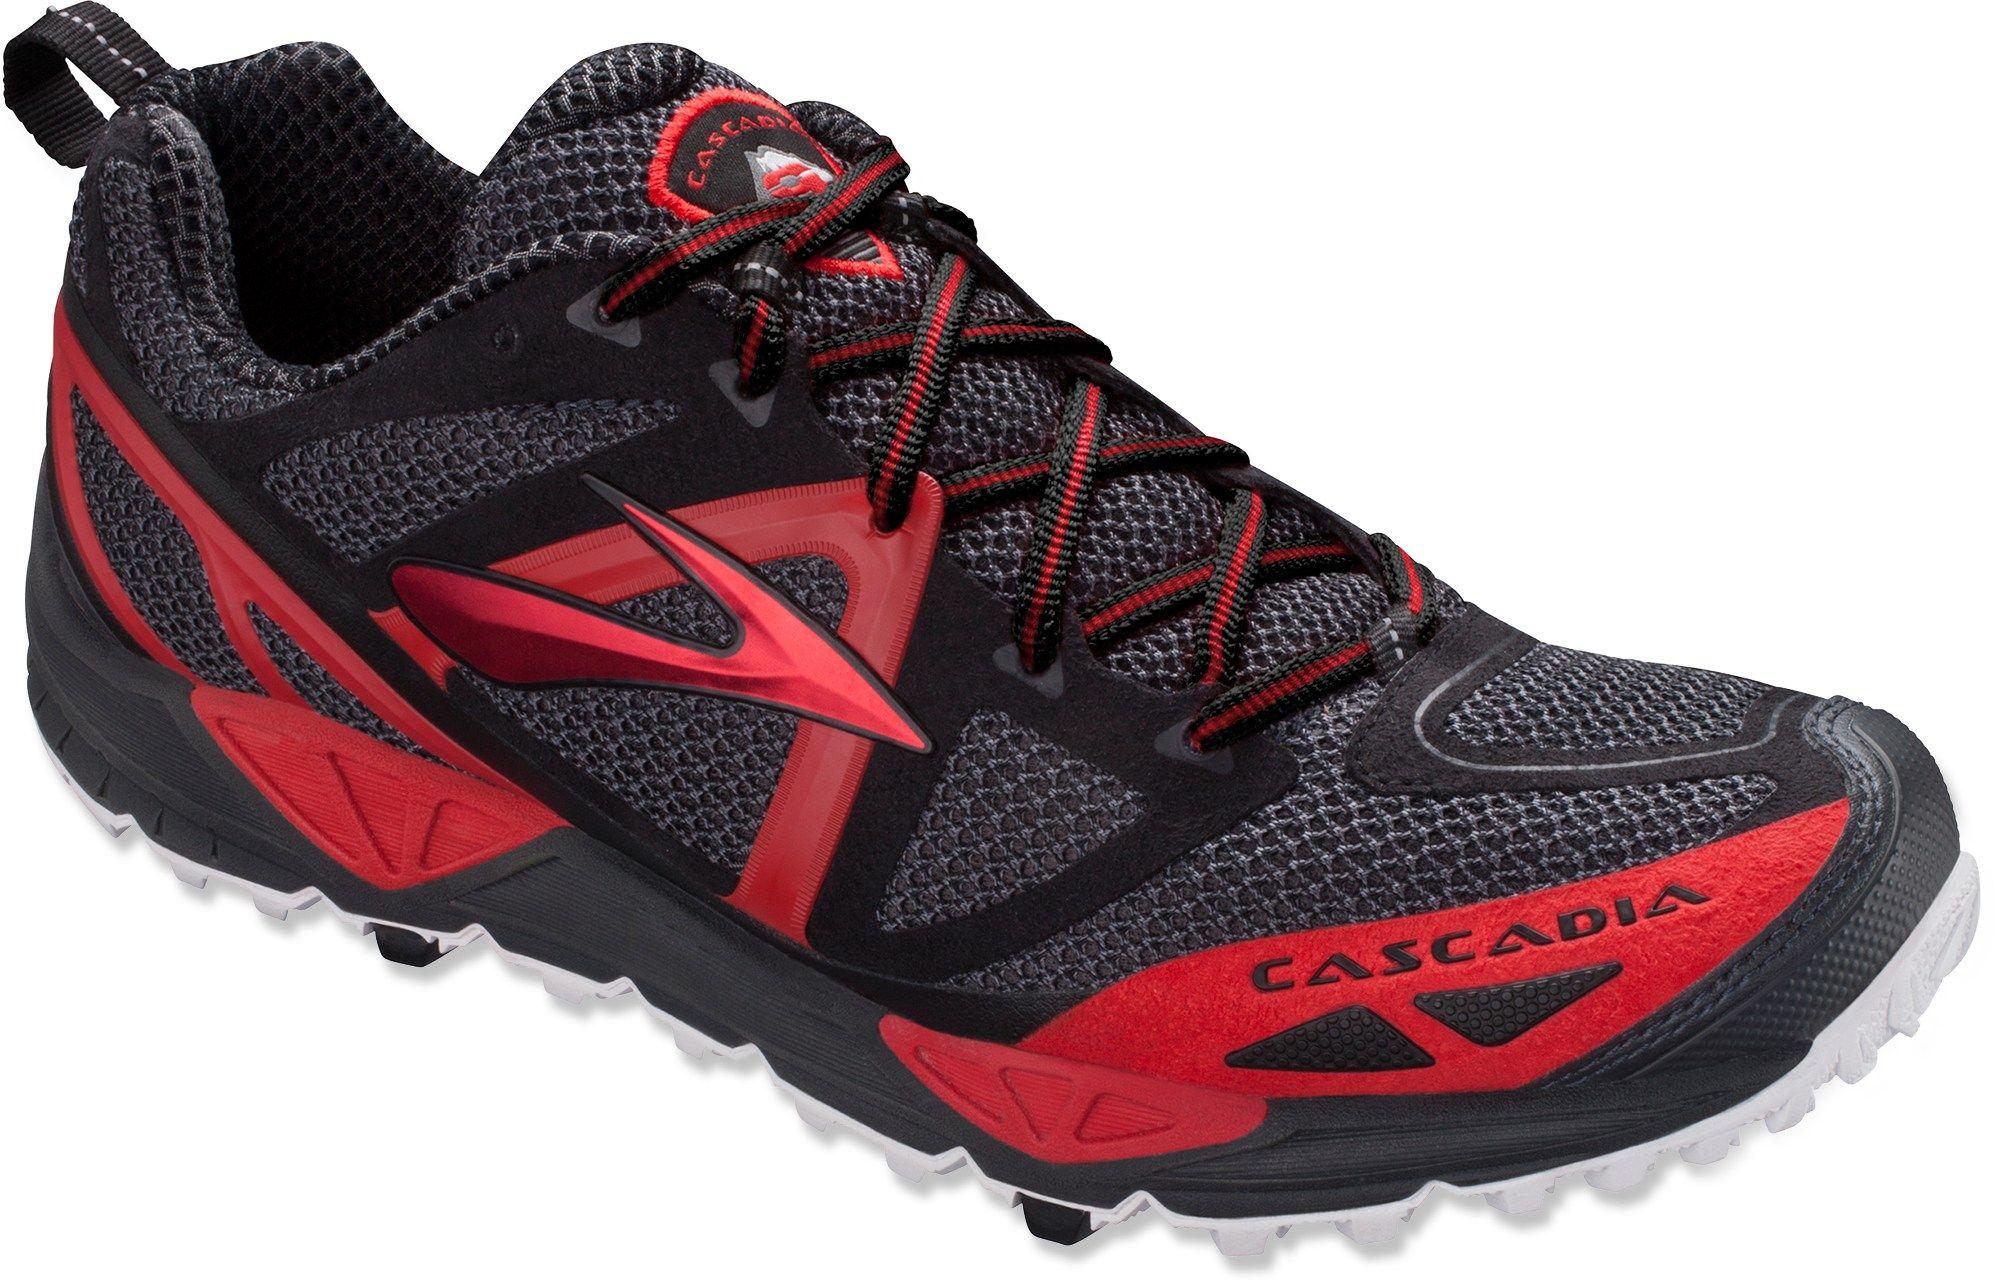 06bbe5c0eac What Footwear Thru-Hikers Wear on the Appalachian Trail ...